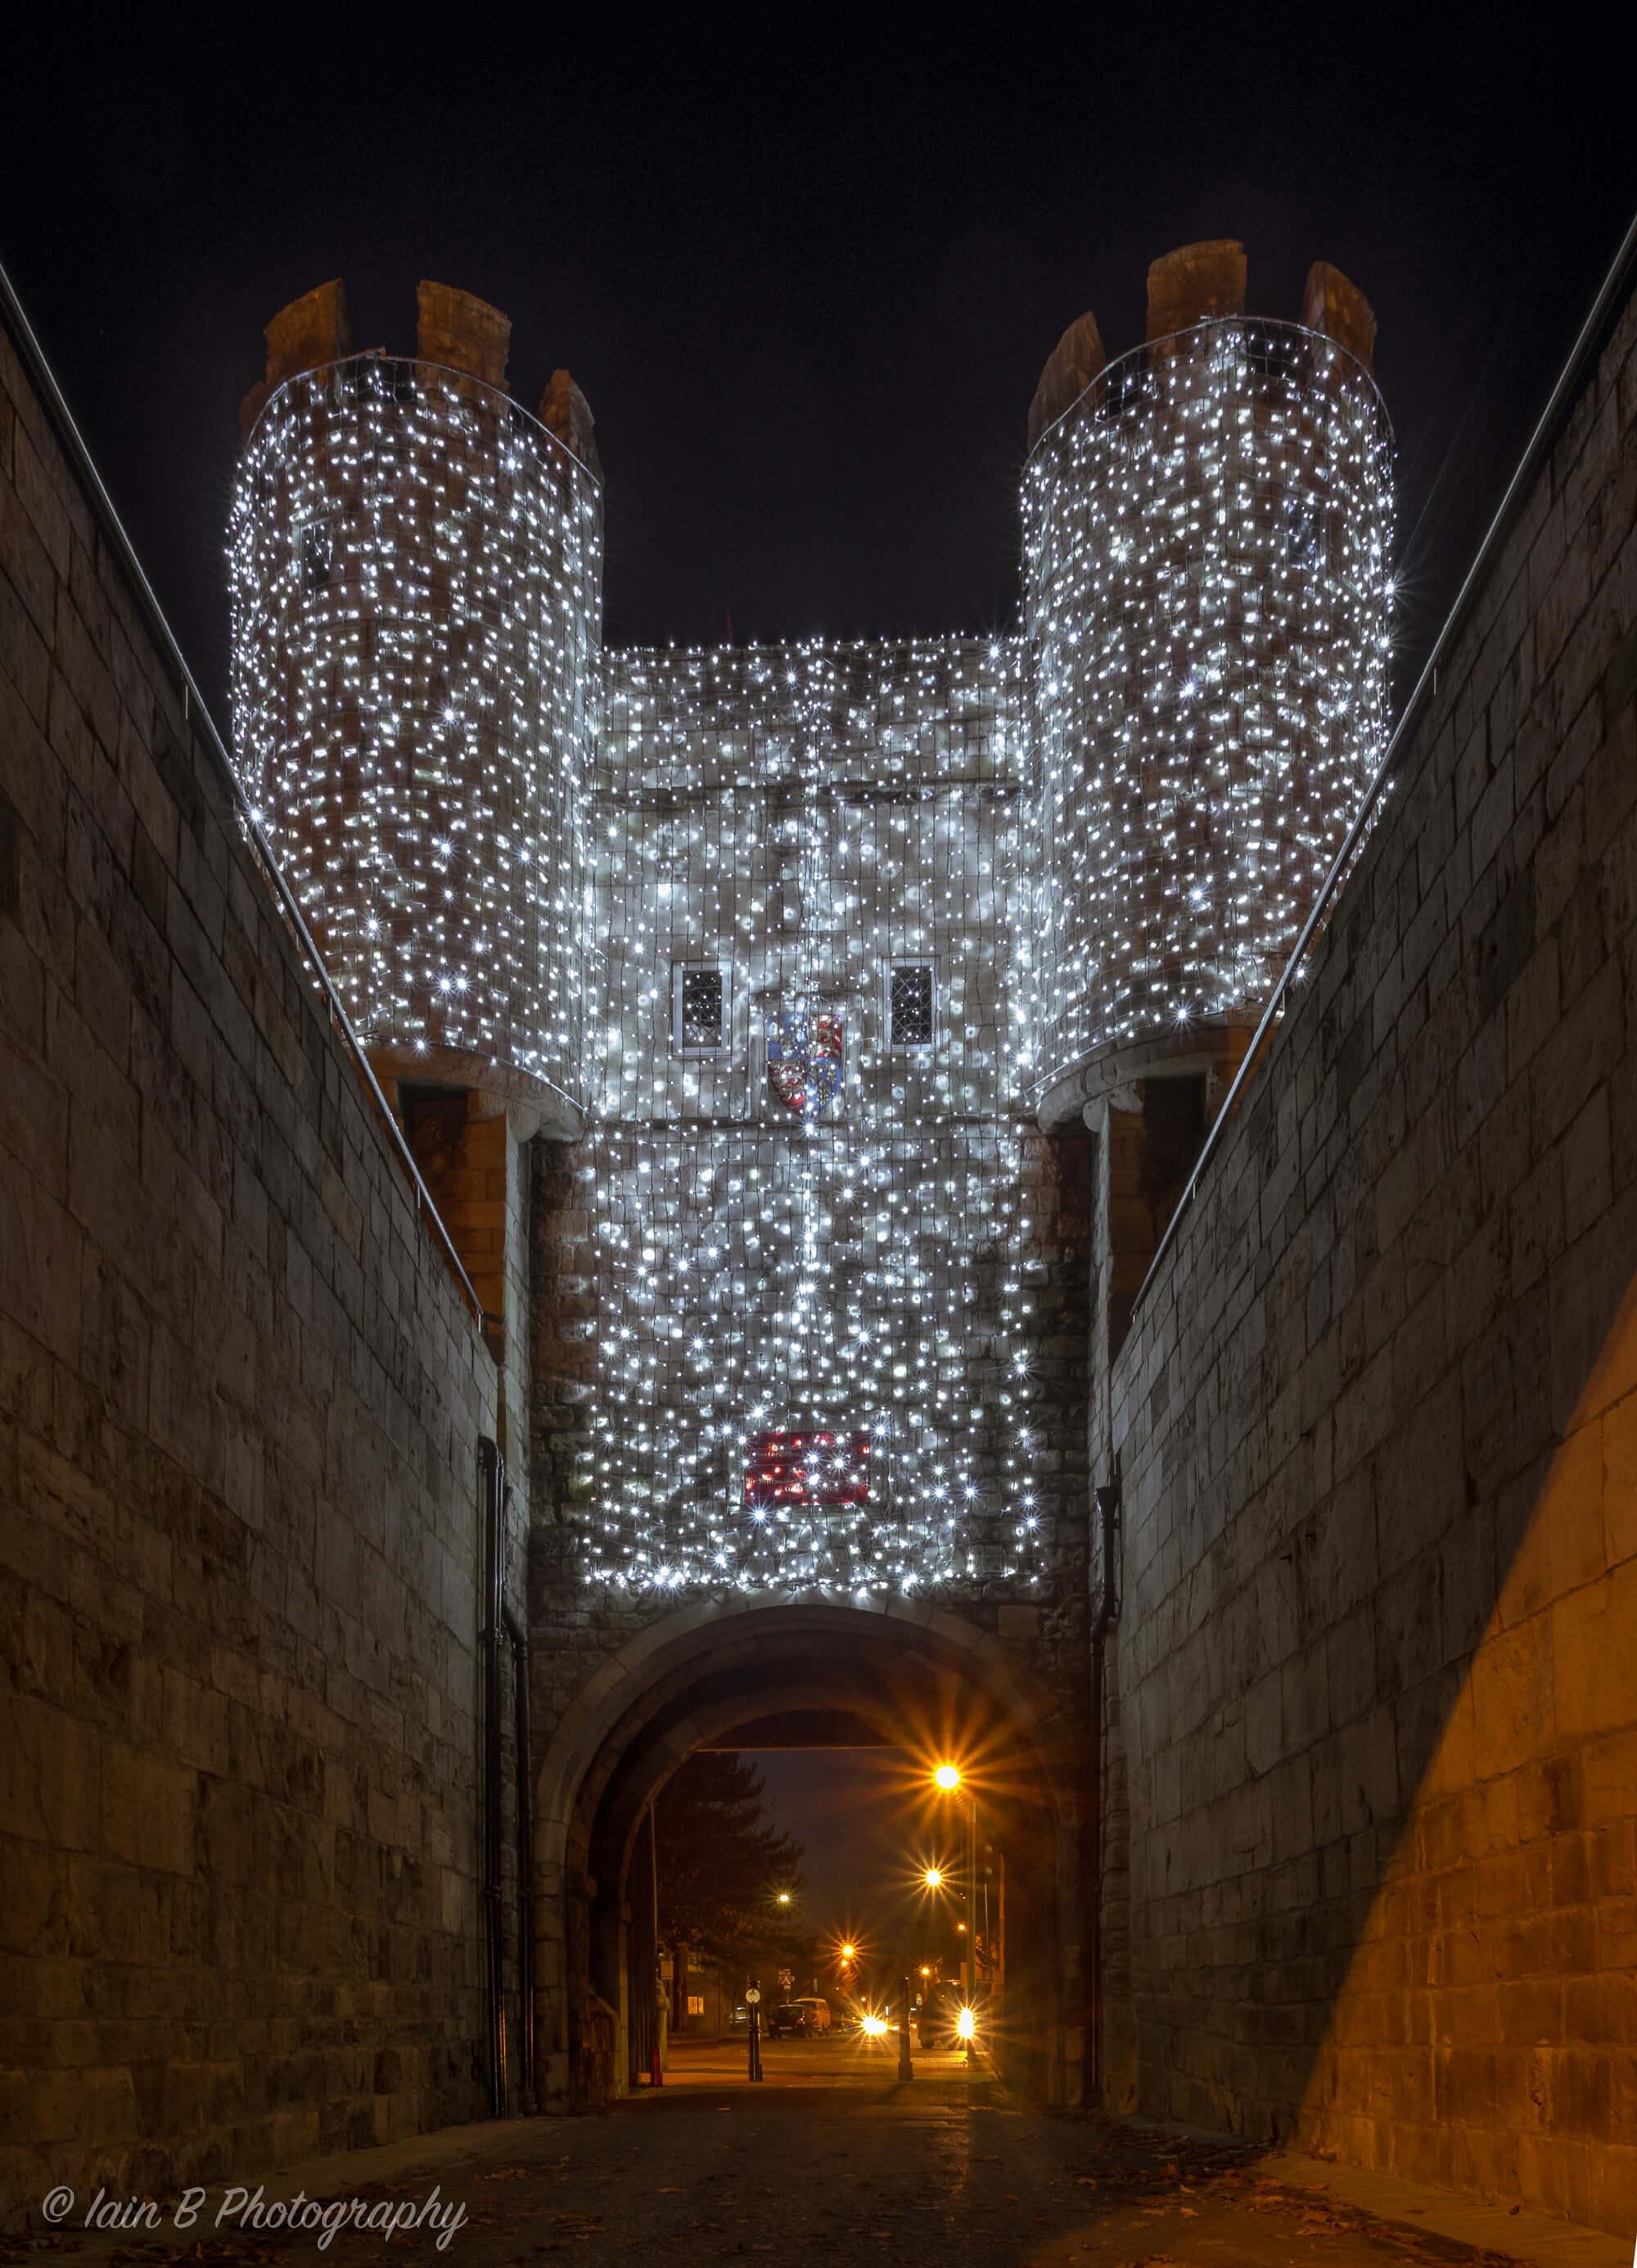 York Walls in Lights